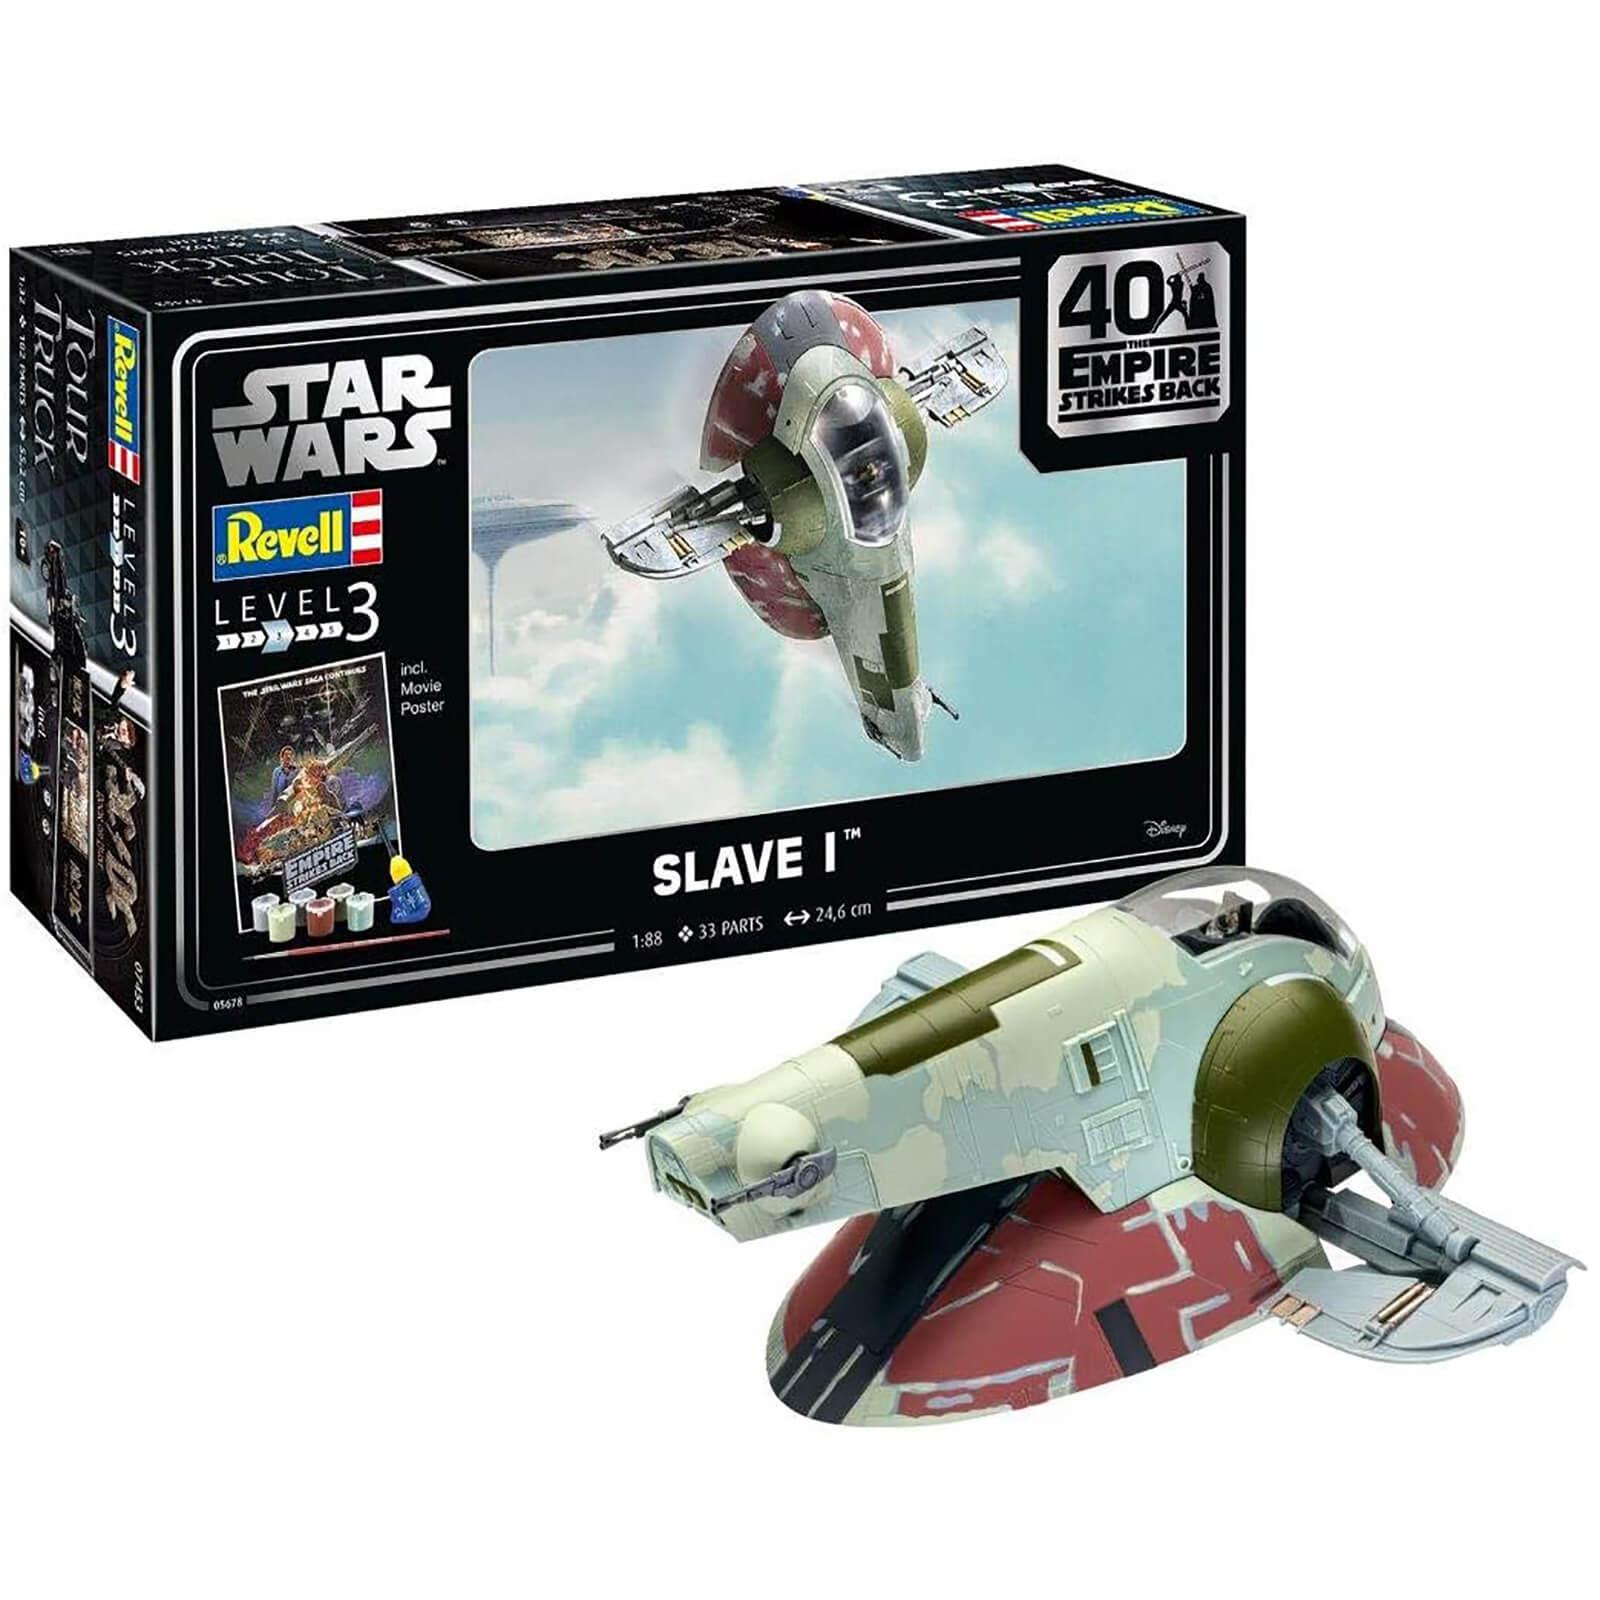 Revell Gift Set - Slave I (The Empire Strikes Back 40th Anniversary) Model (Scale 1:88)